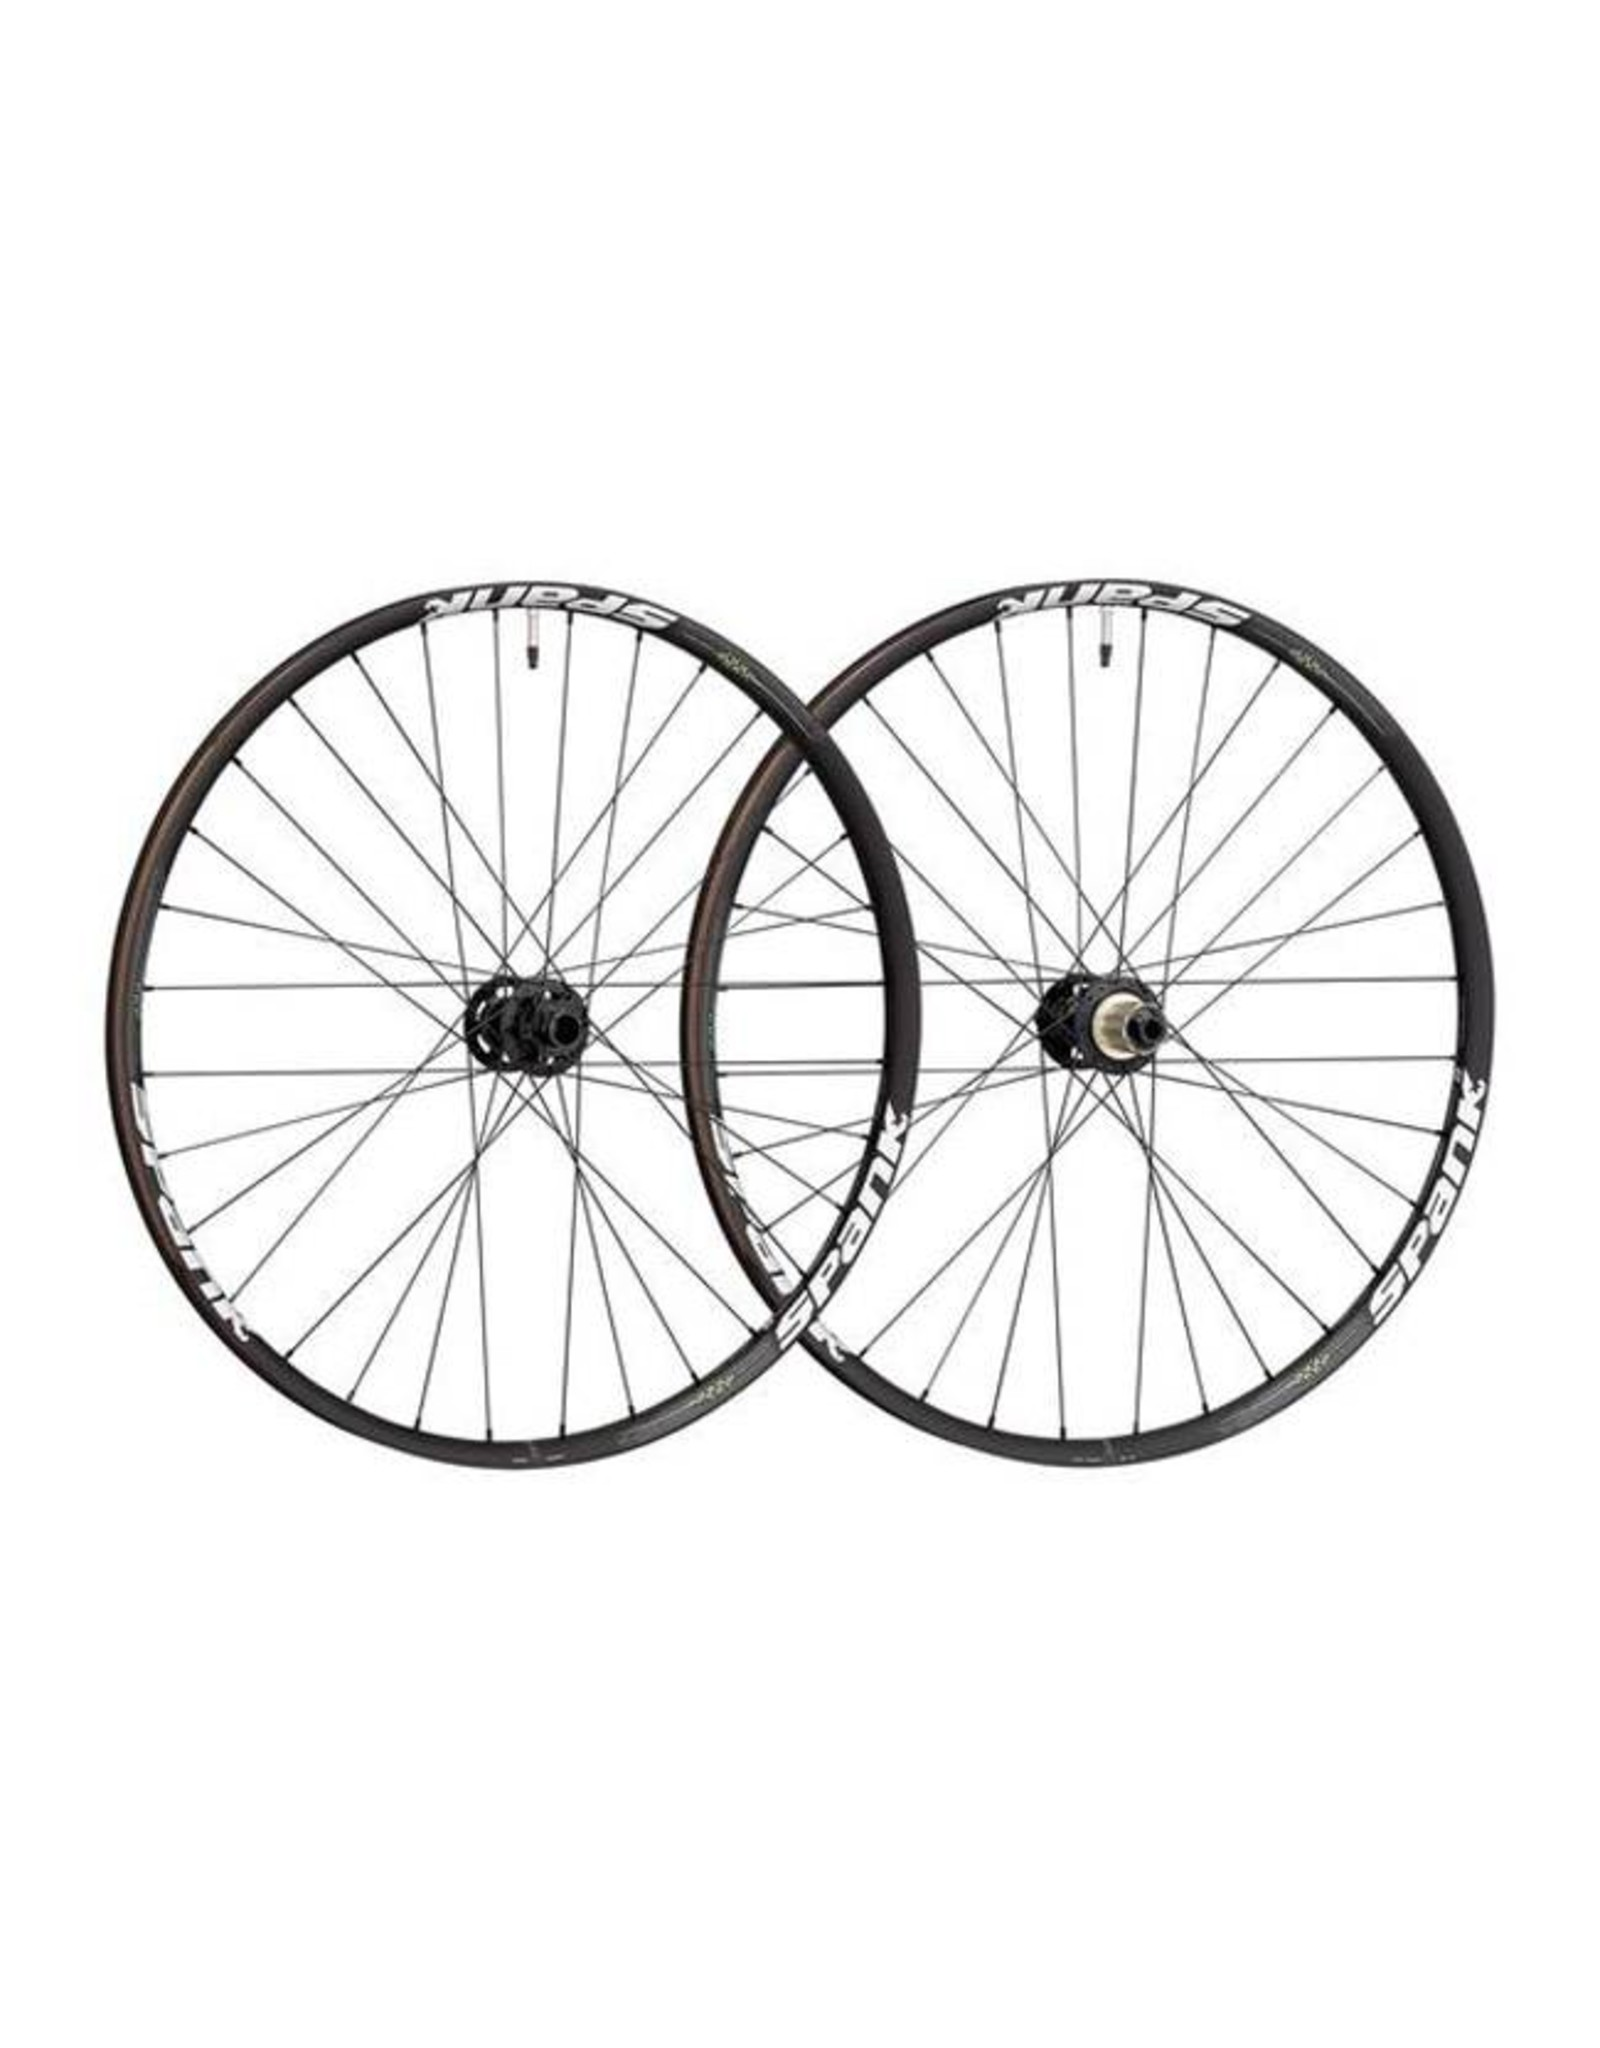 "Spank Spank Spike 350 Vibrocore Wheelset 27.5"" 150/157mm Black"